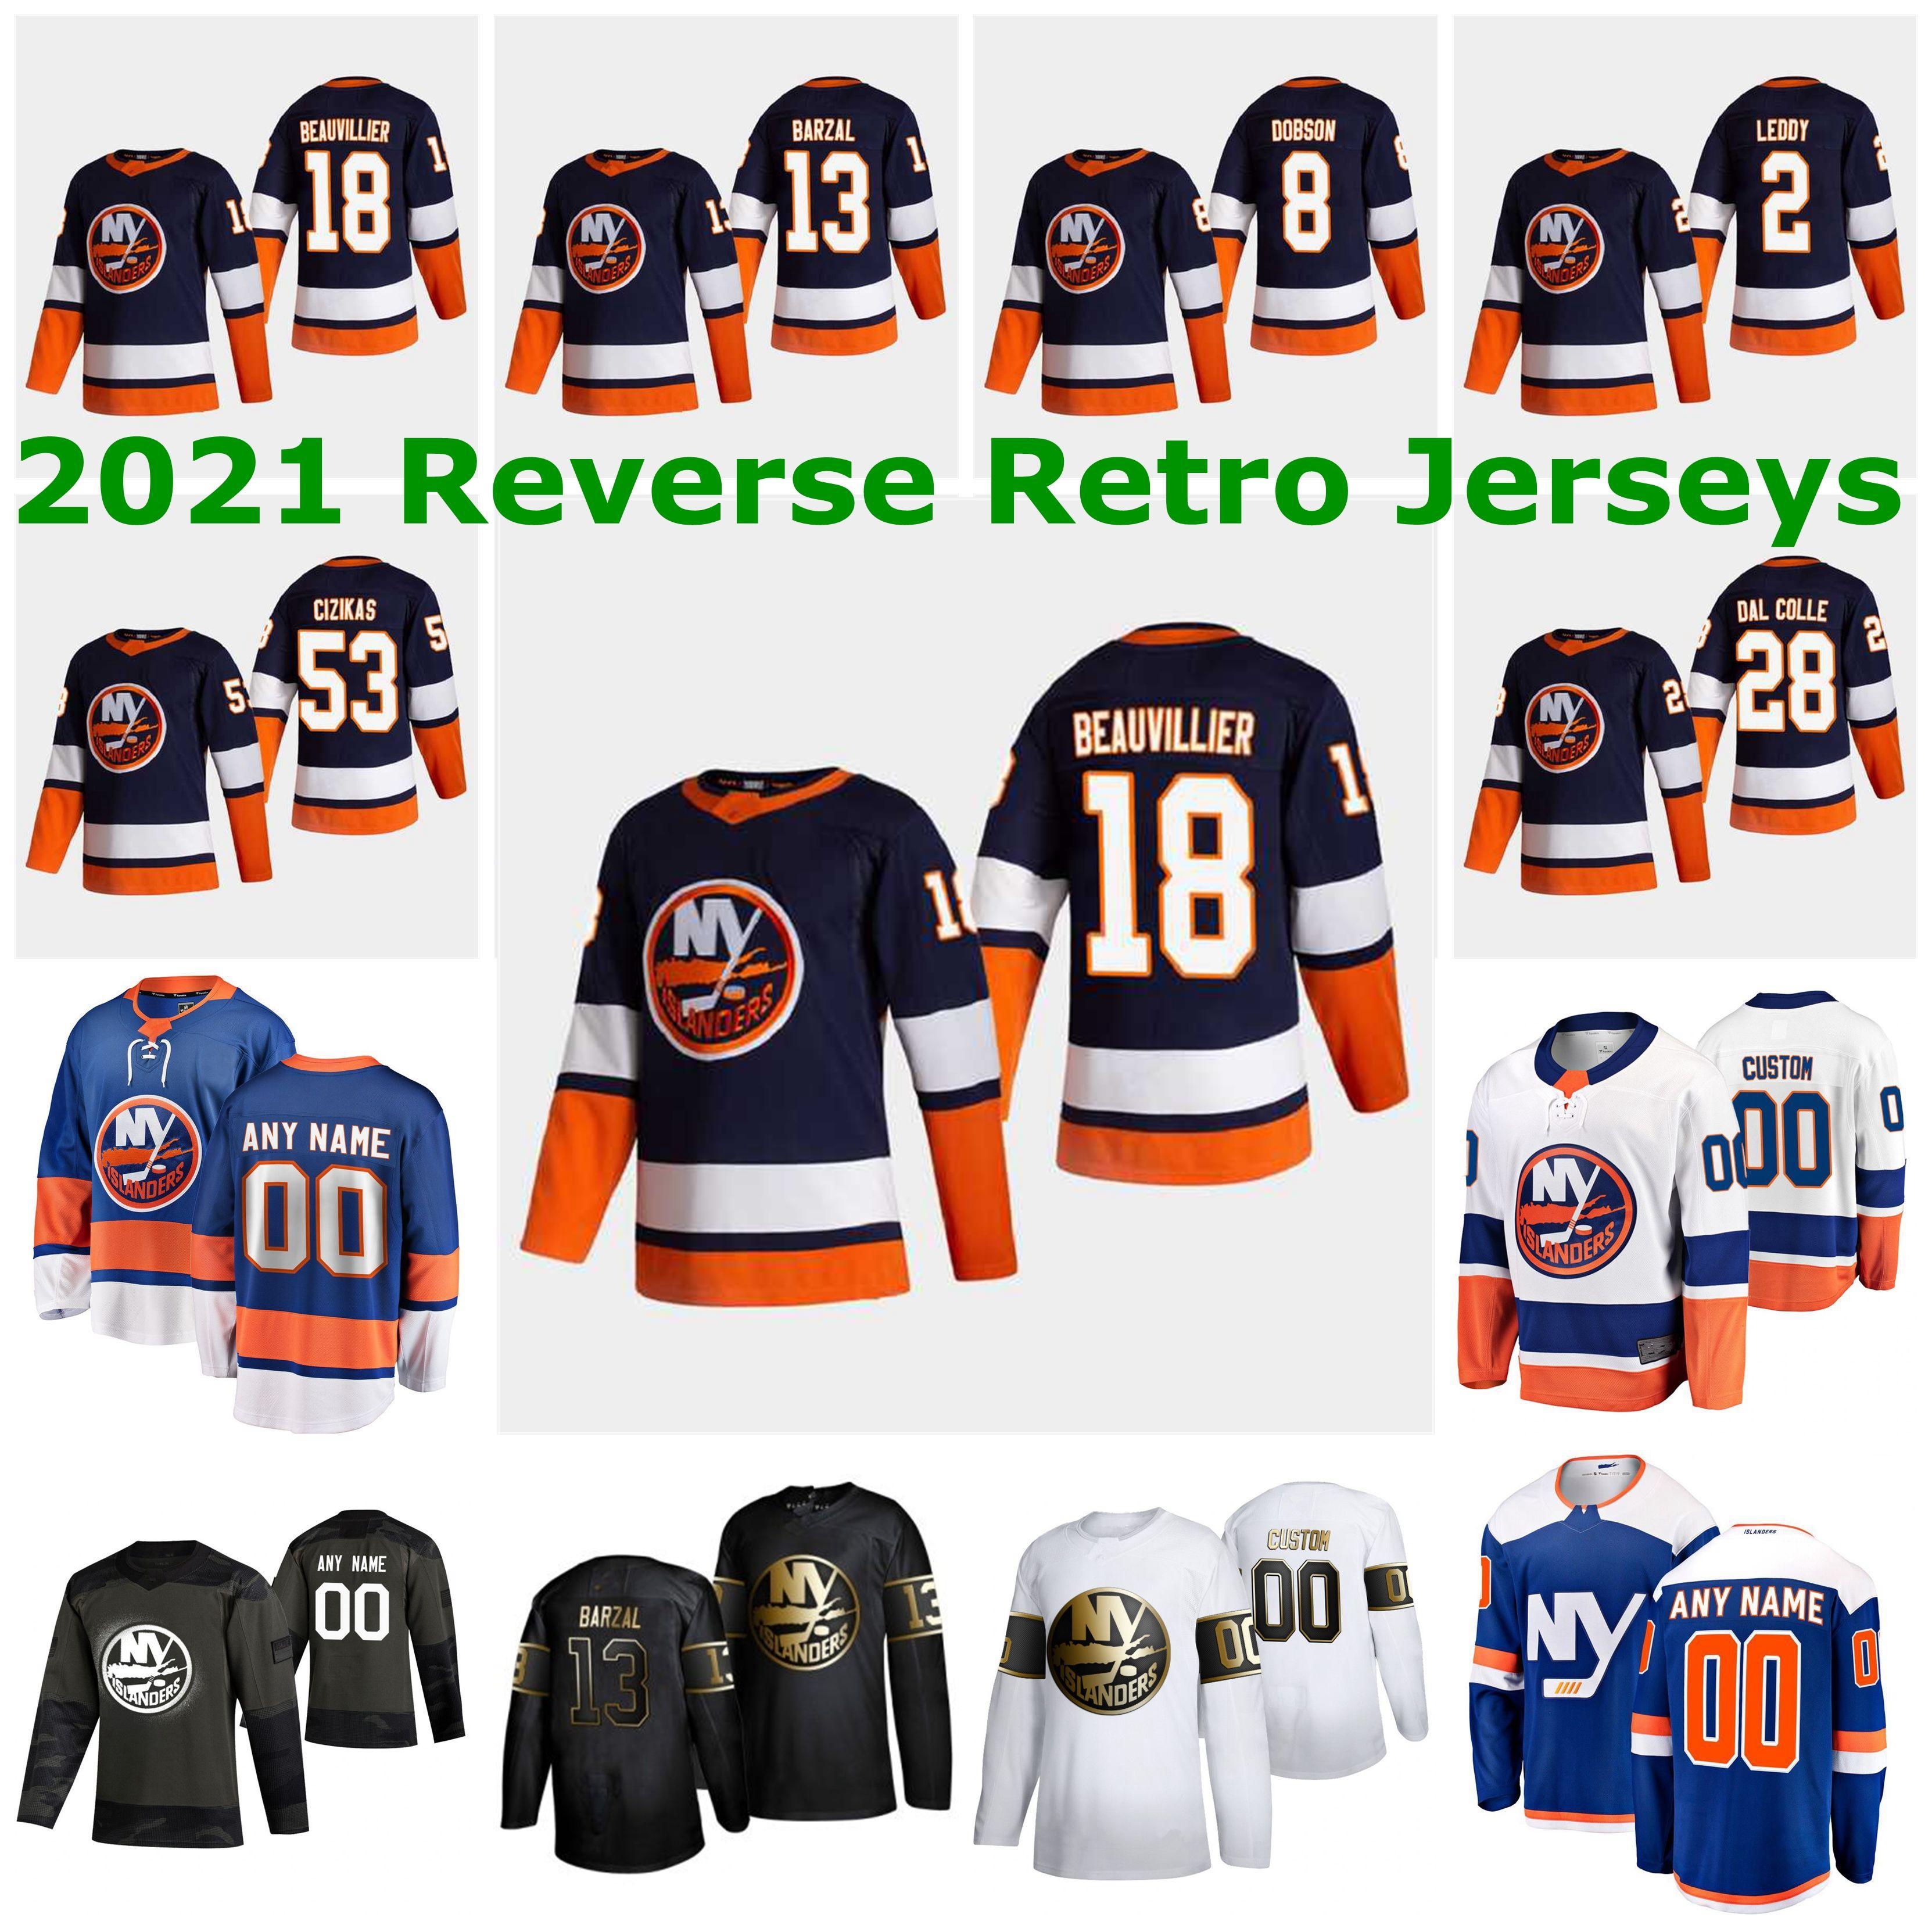 New York Islanders 2021 Reverse Retro Jerseys 13 Mathew Barzal Jersey 27 Anders Lee Matt Martin Josh Bailey Cal Clutterbuck Custom Stitched